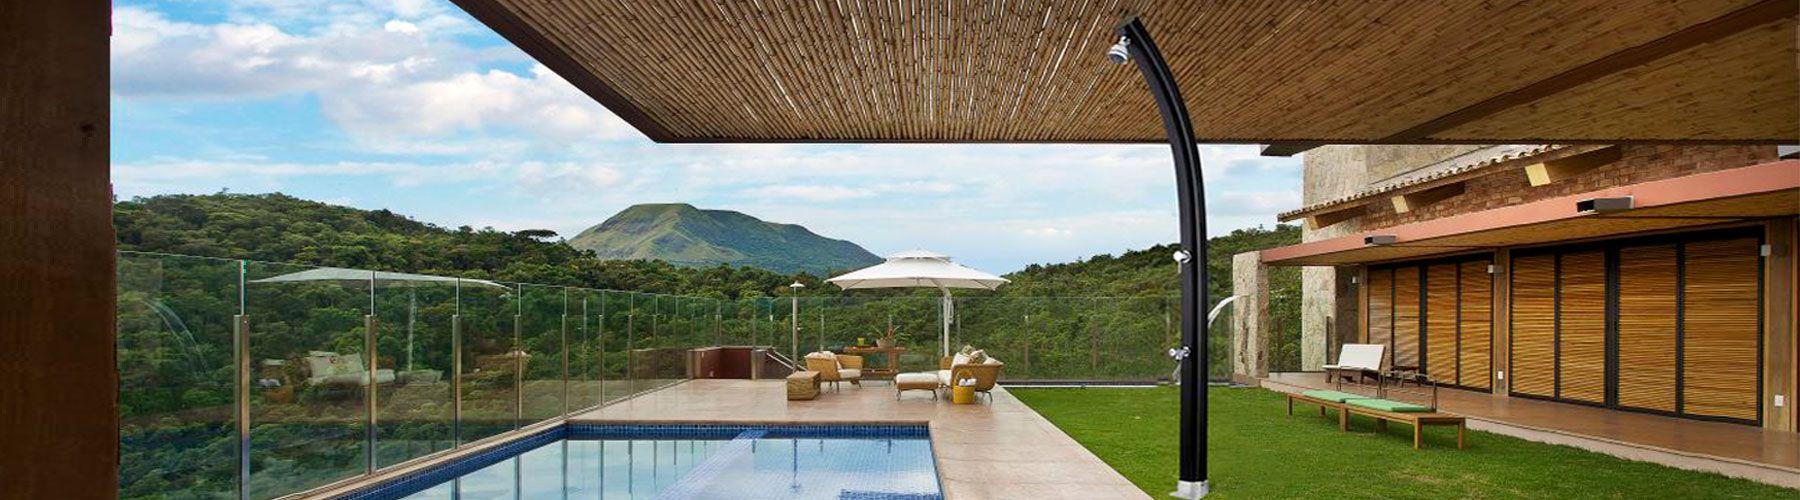 Duchas de piscinas ducha agua caliente iguazu astral pool - Duchas de piscina ...